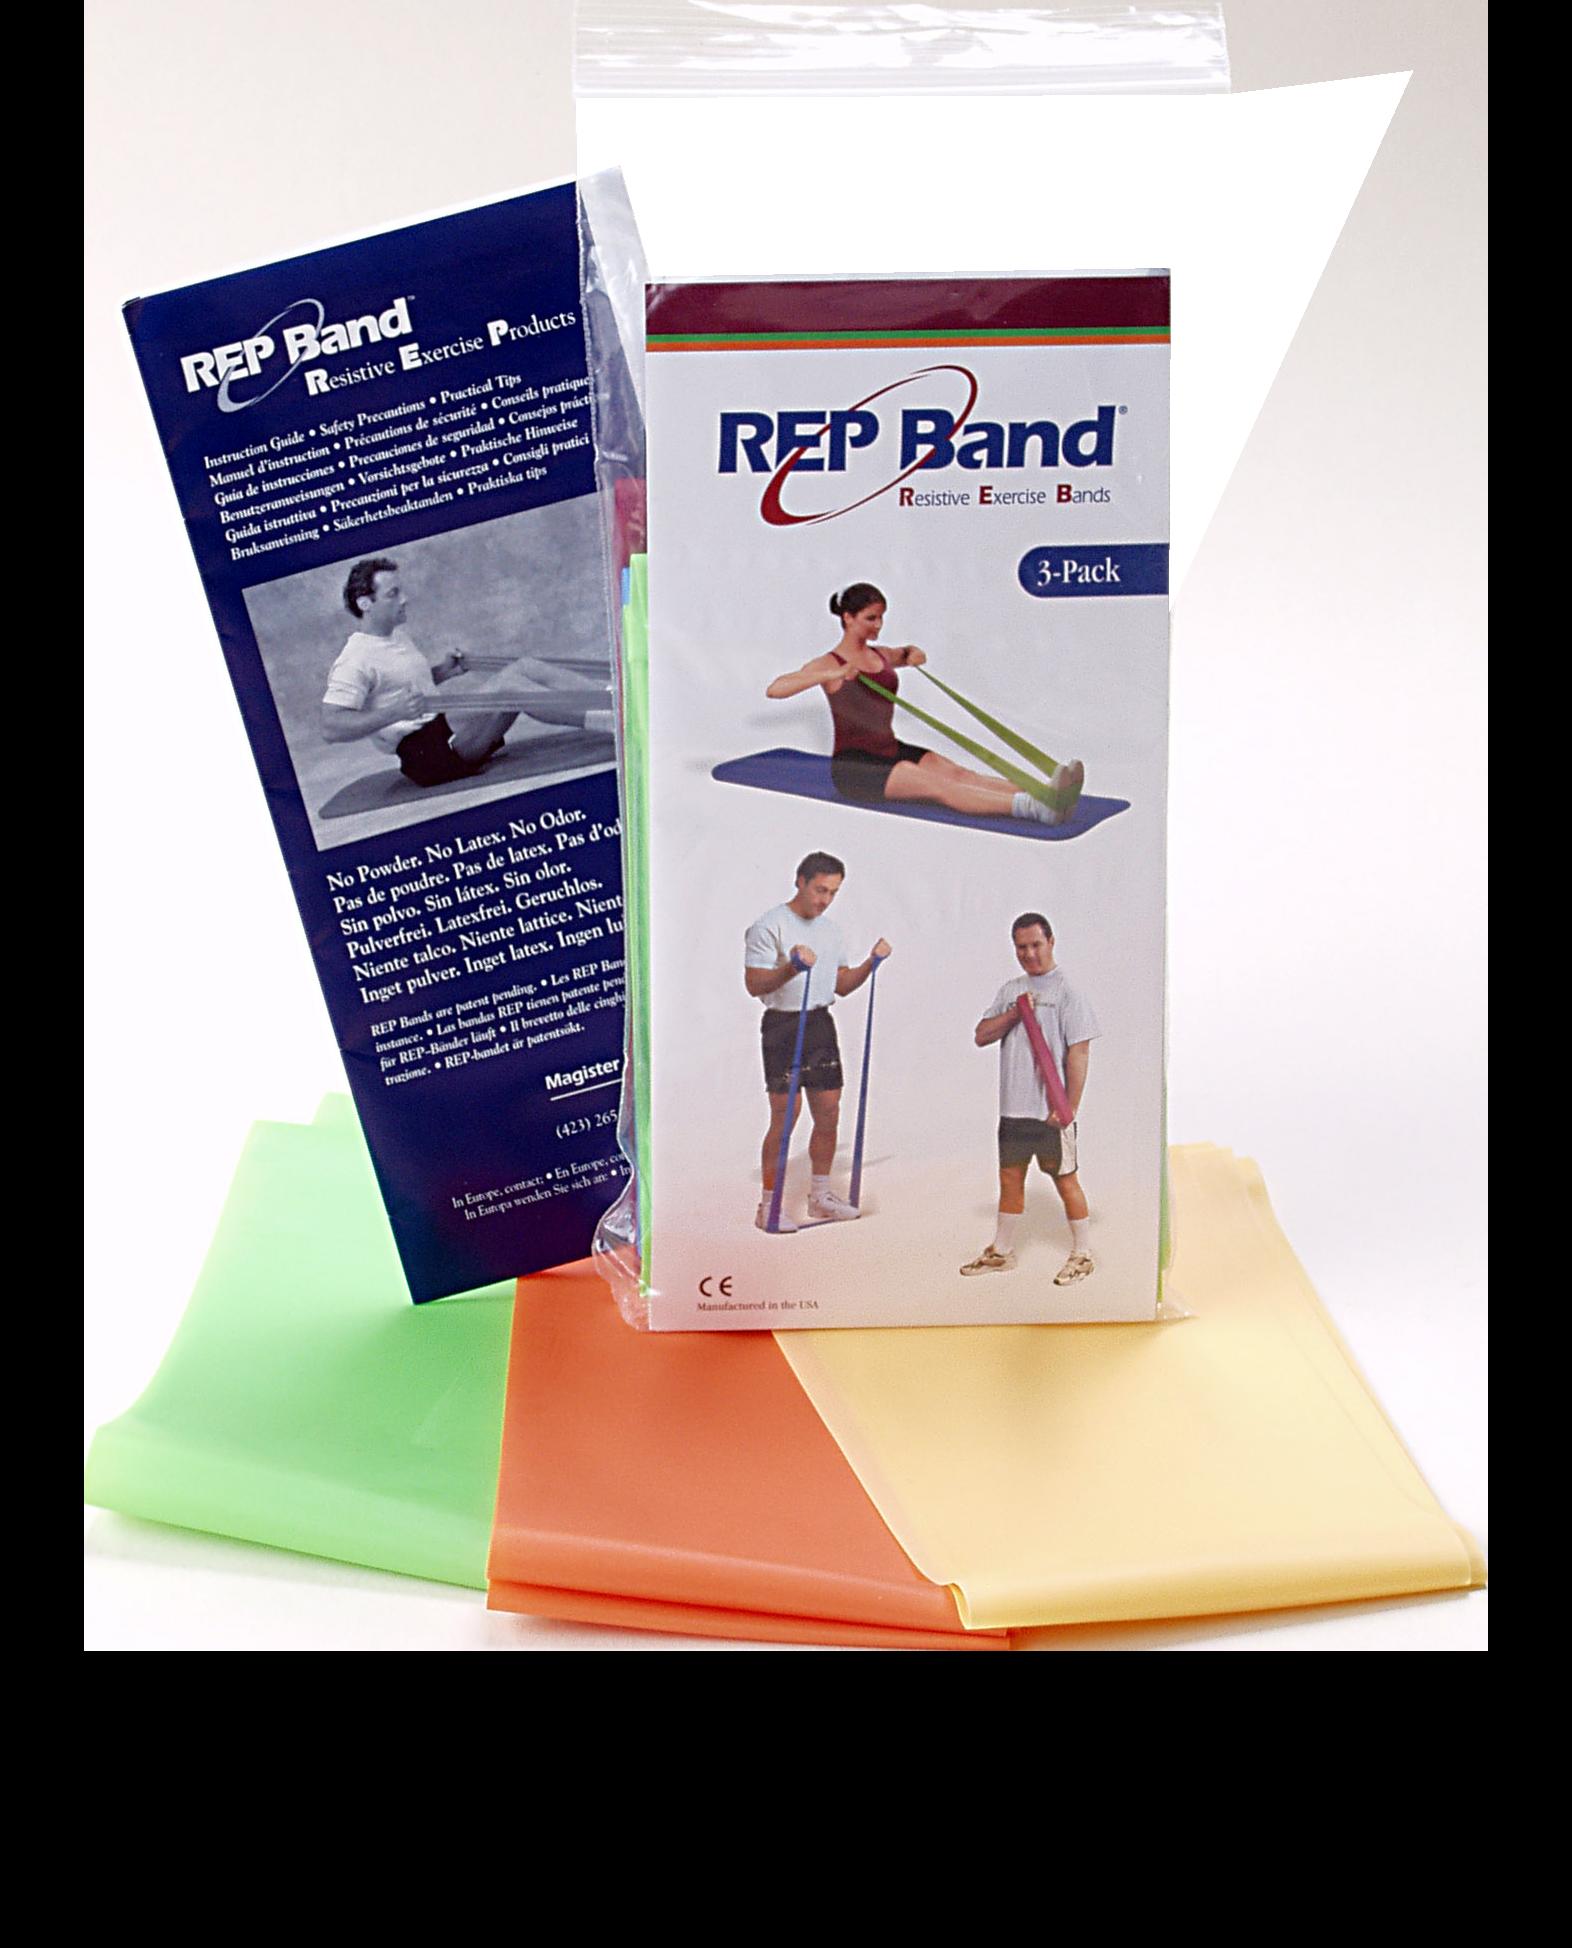 Kit de 3 Rep Band para ejercicio